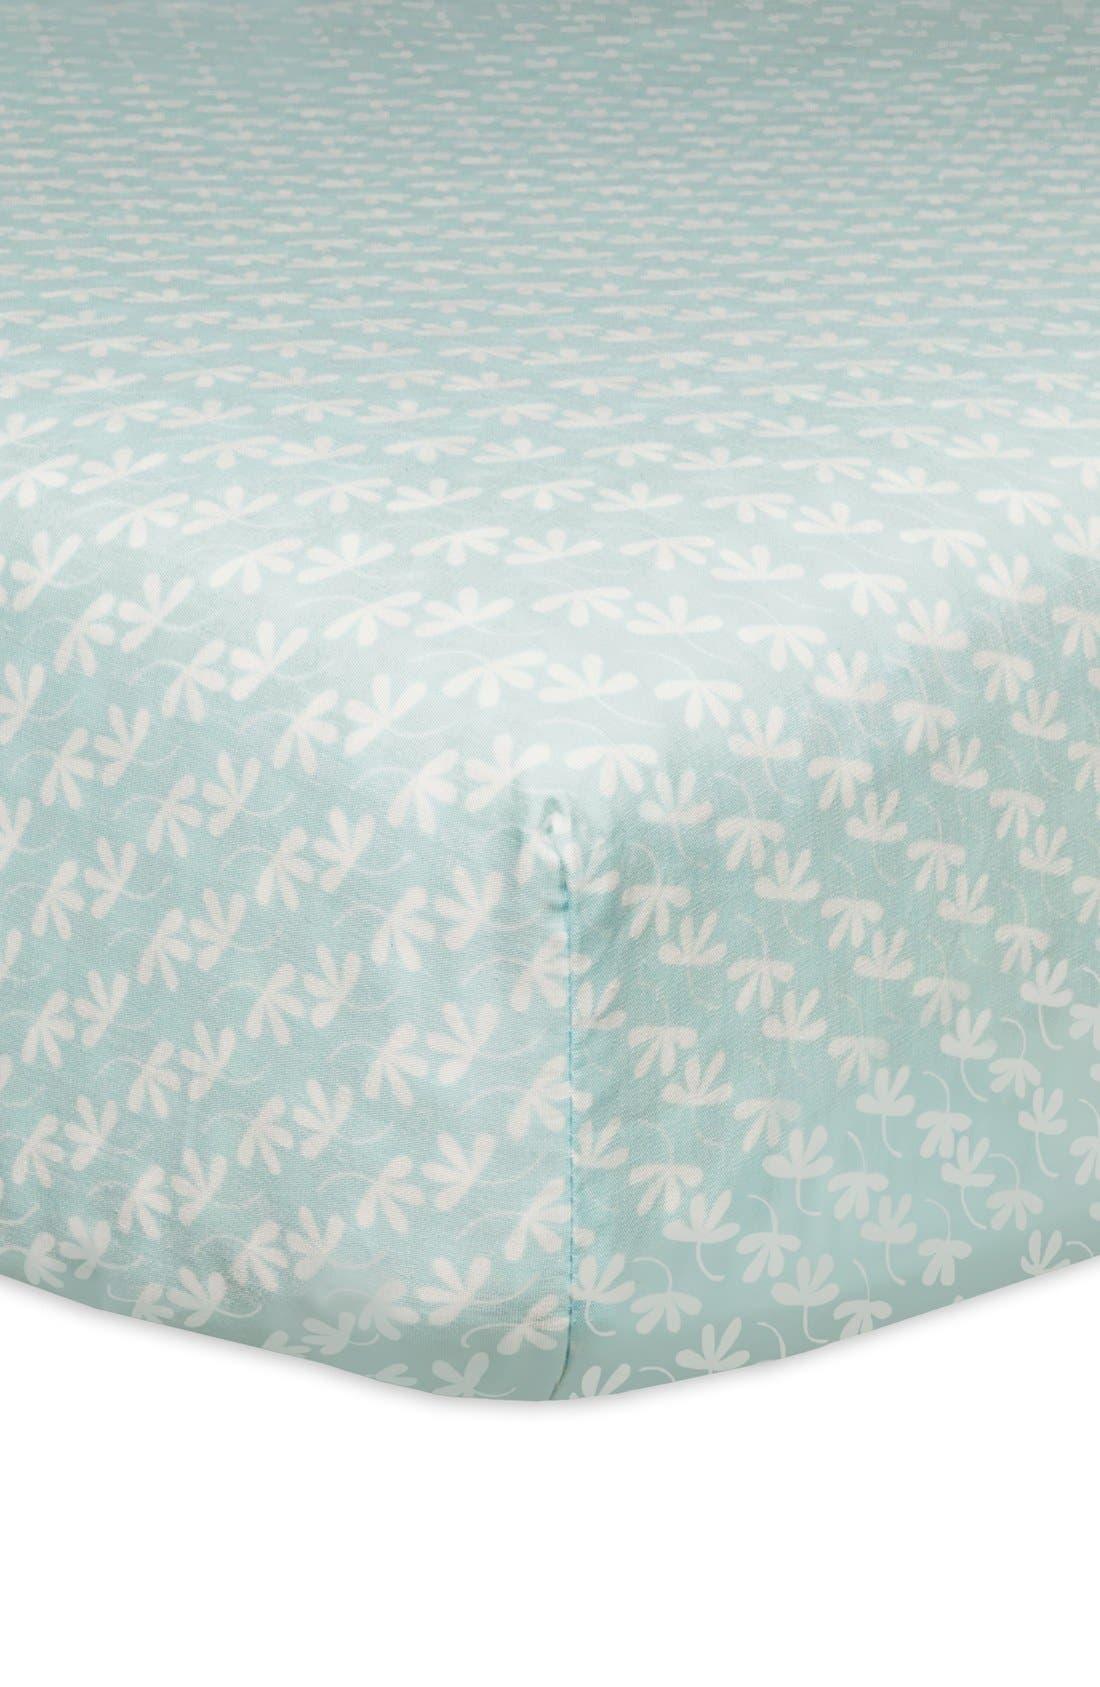 'Flora' Crib Sheet, Crib Skirt, Changing Pad Cover, Blanket & Wall Decals,                             Alternate thumbnail 2, color,                             400